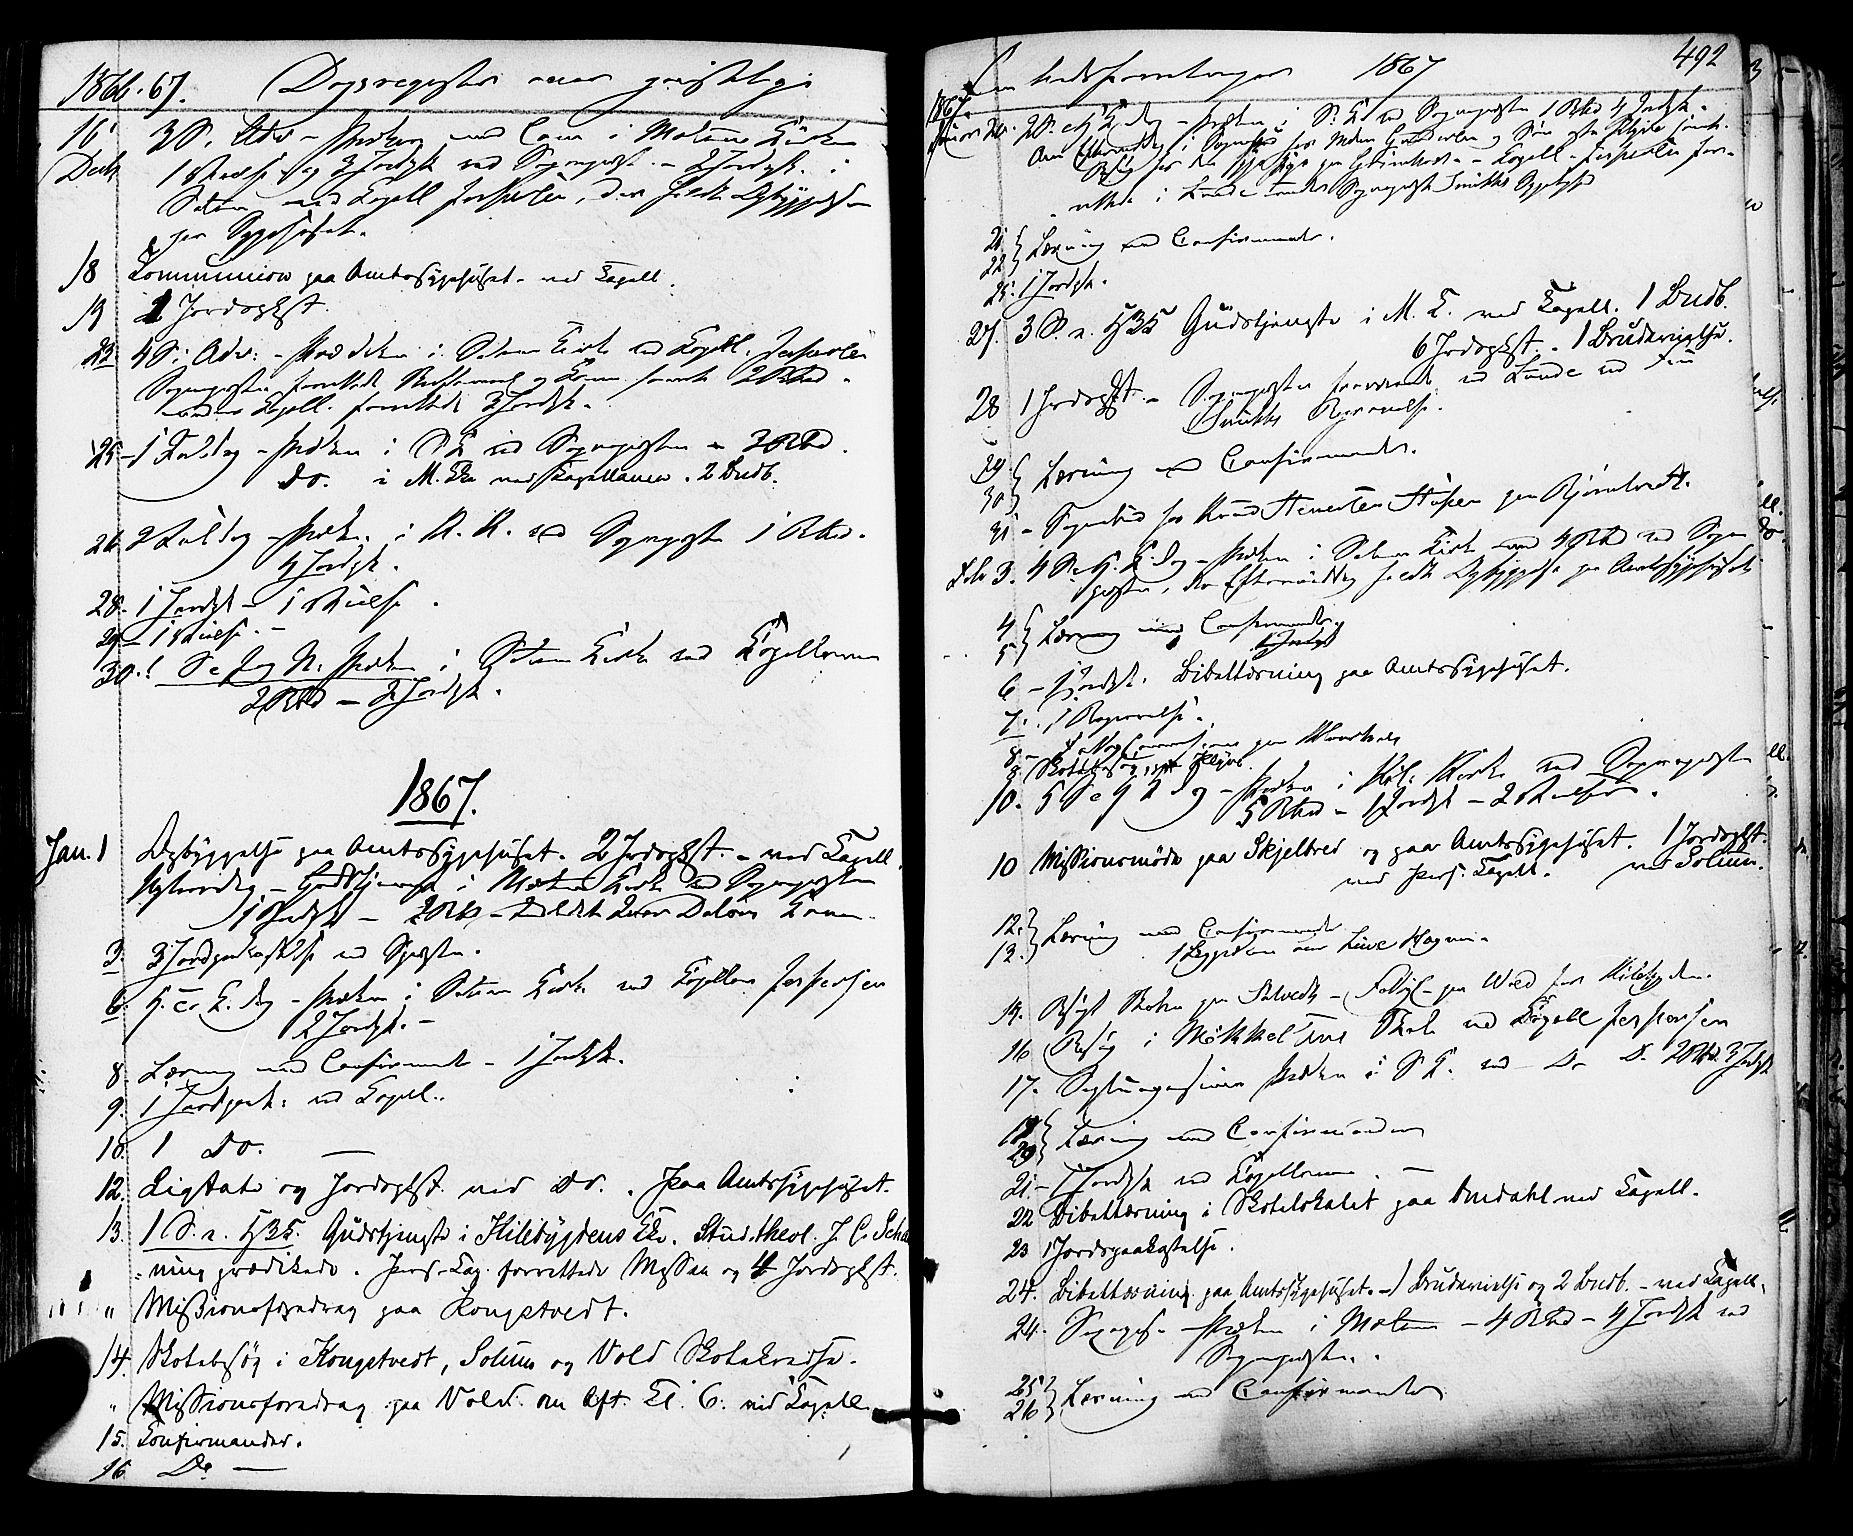 SAKO, Solum kirkebøker, F/Fa/L0008: Ministerialbok nr. I 8, 1865-1876, s. 492